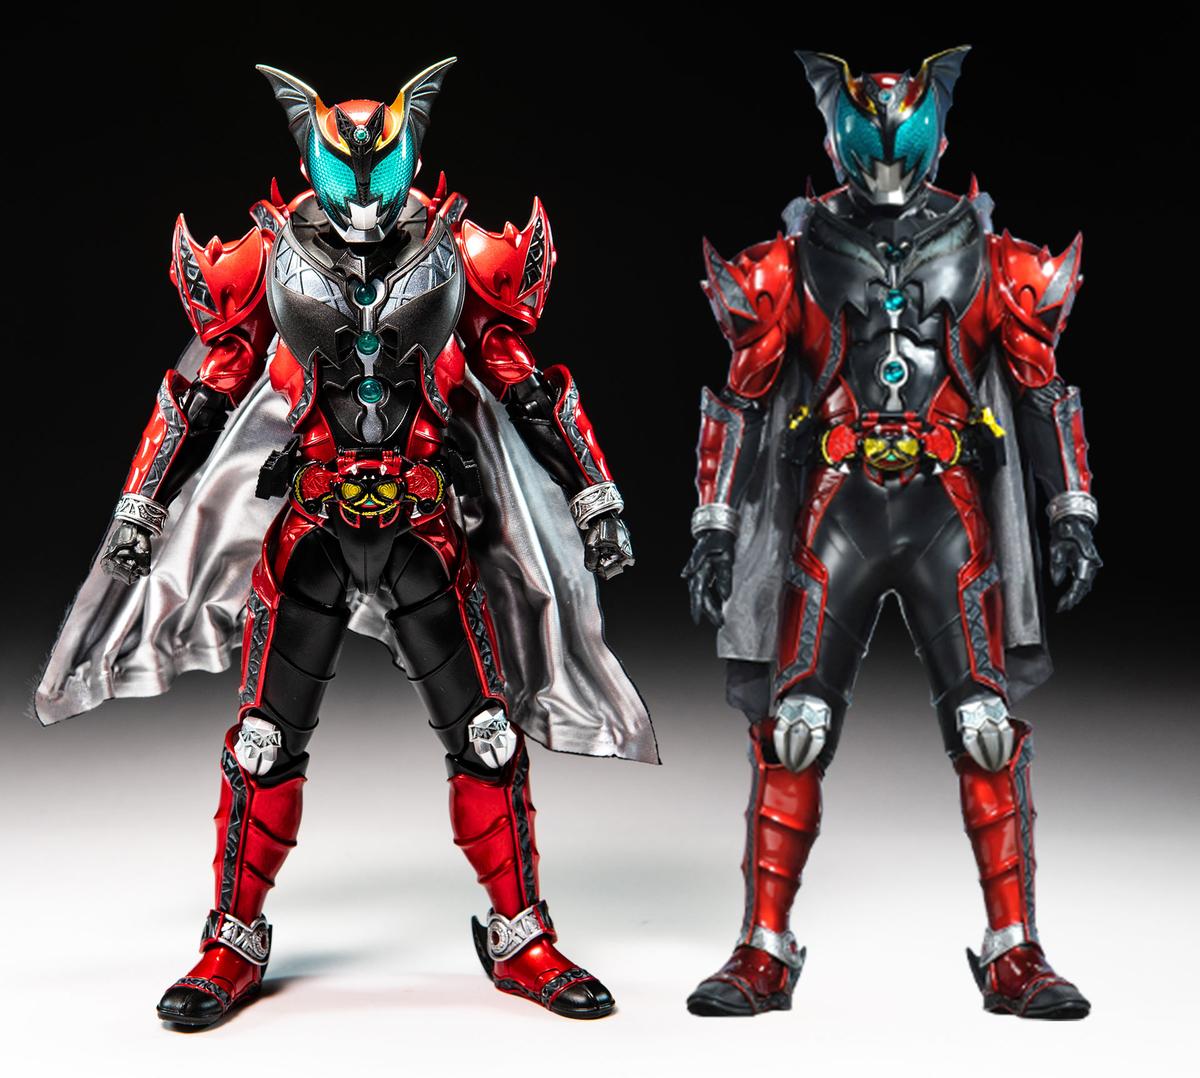 f:id:hiroban-ch:20211006230750j:plain